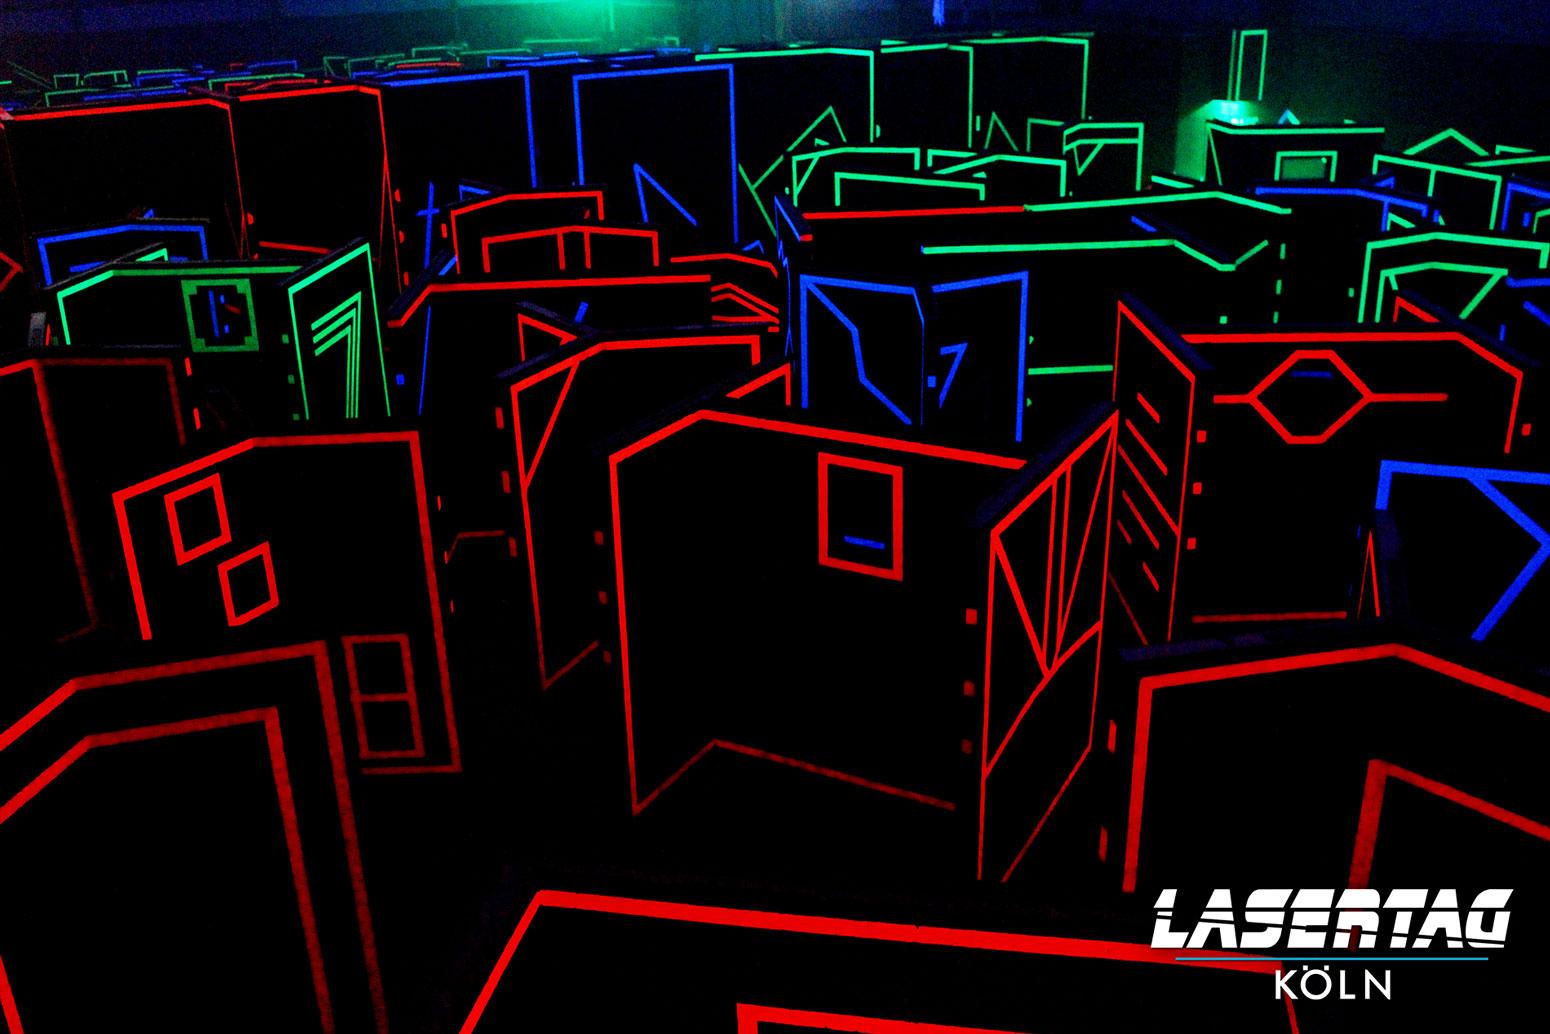 Kölner Lasertag